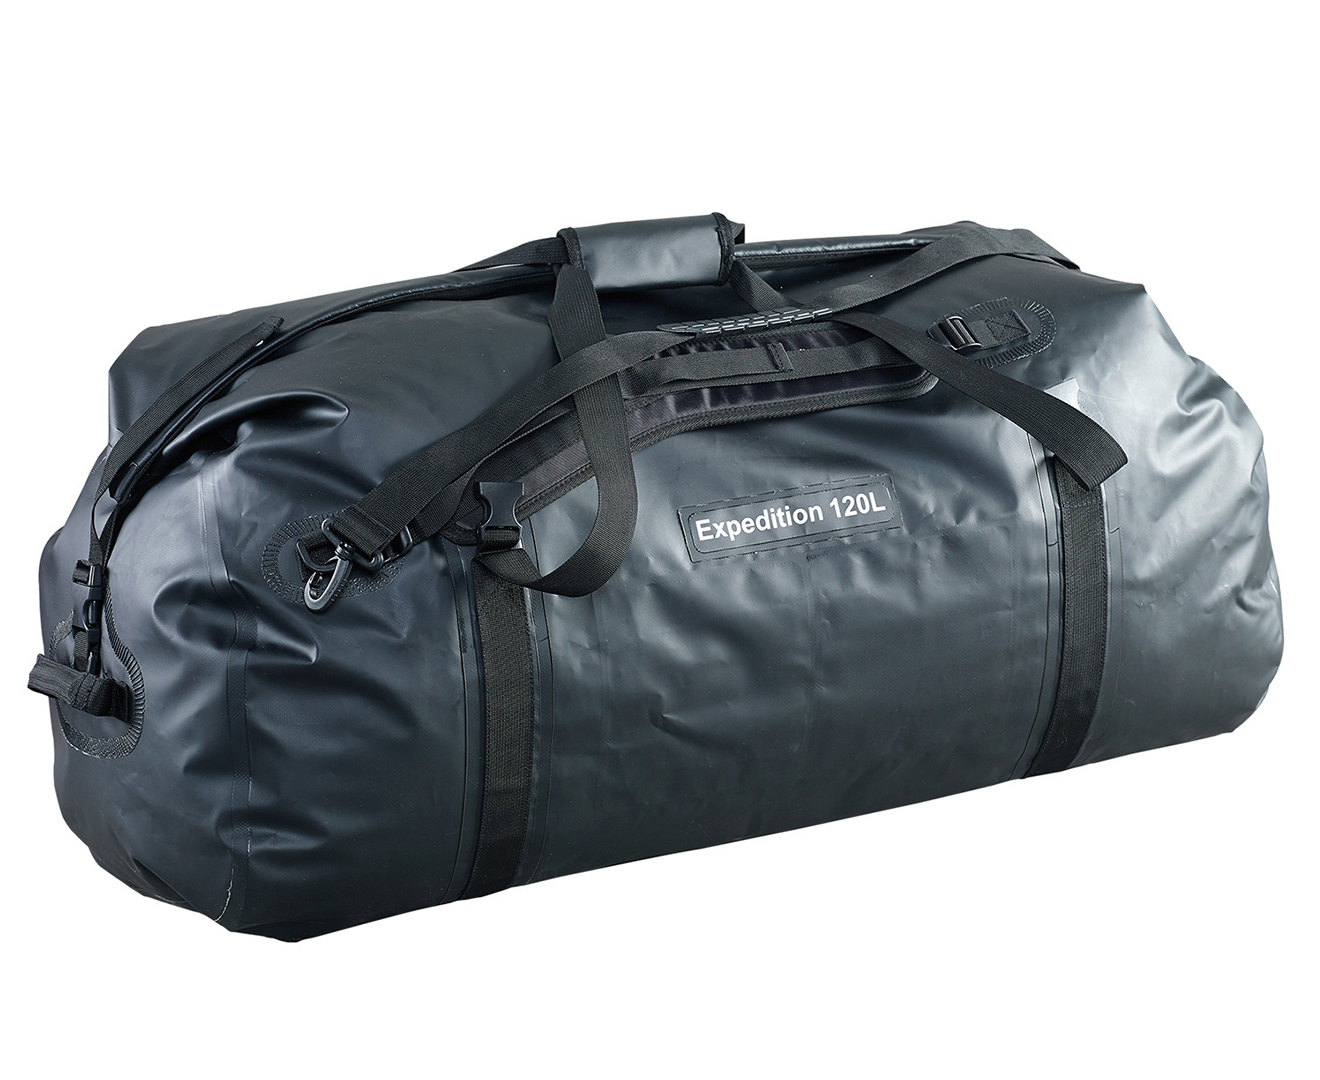 NEW CARIBEE EXPEDITION WET ROLL BAG 120L TRAVEL ADVENTURE CAMP WATERPROOF BLACK